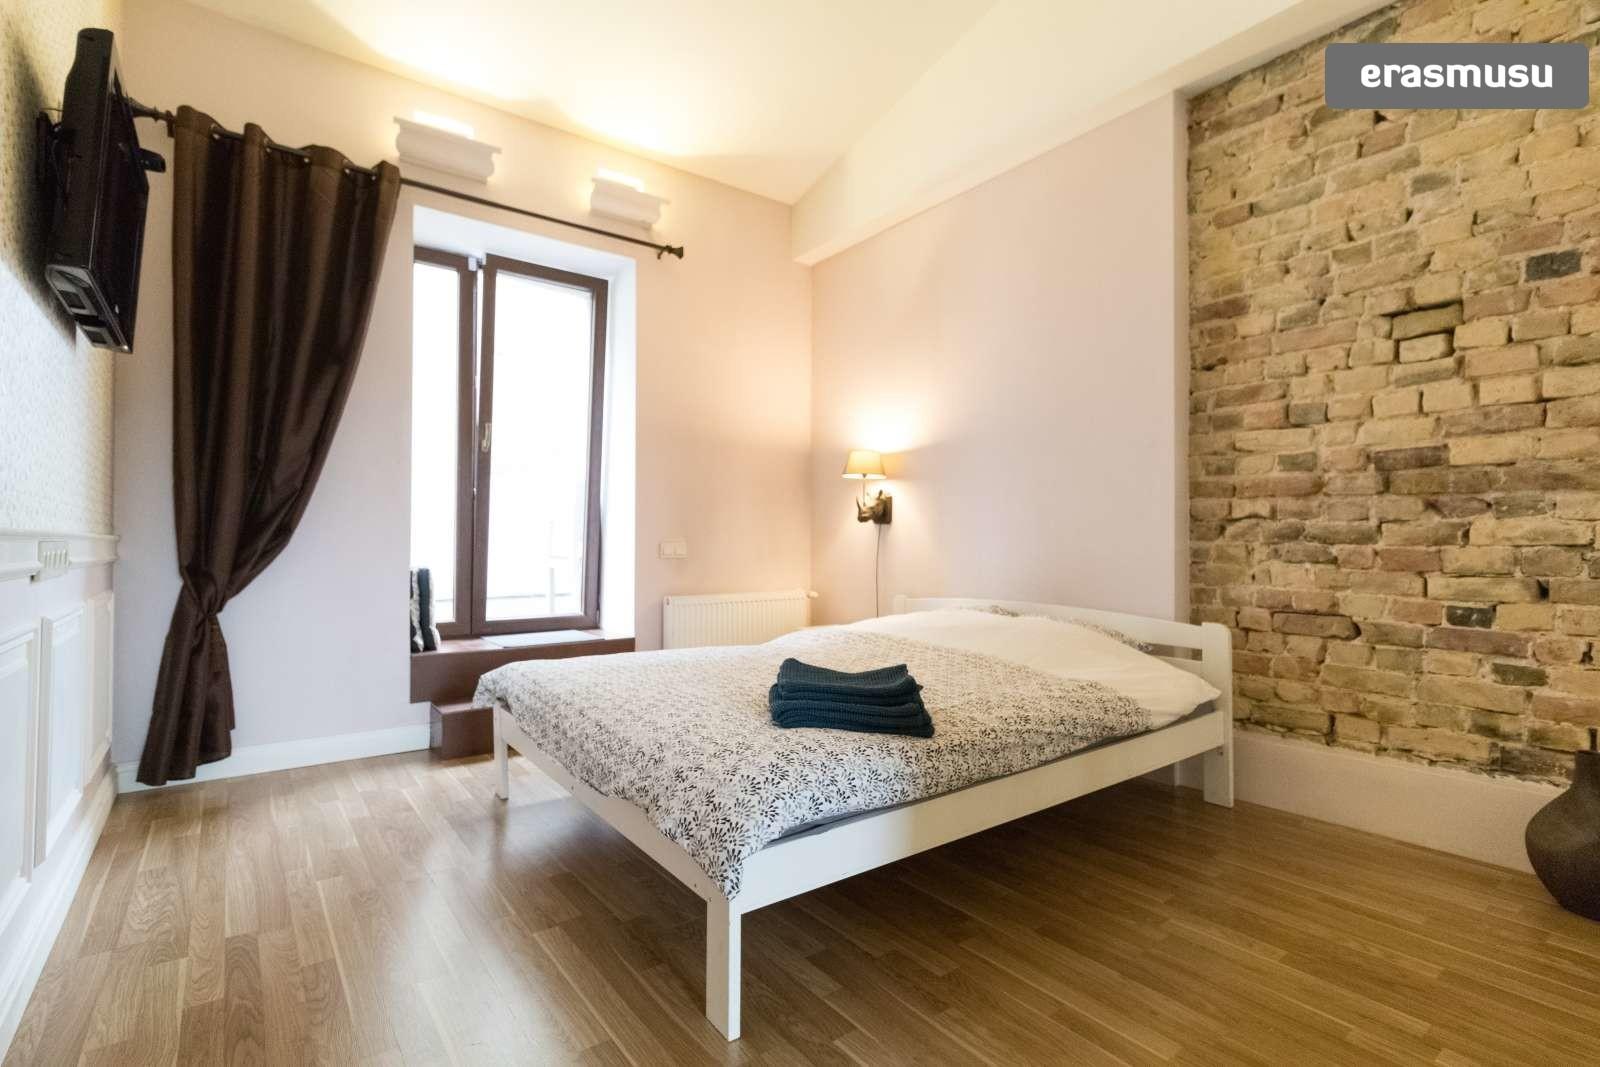 modern-studio-apartment-rent-maskavas-forstate-79bb2c9b8f3fbc269